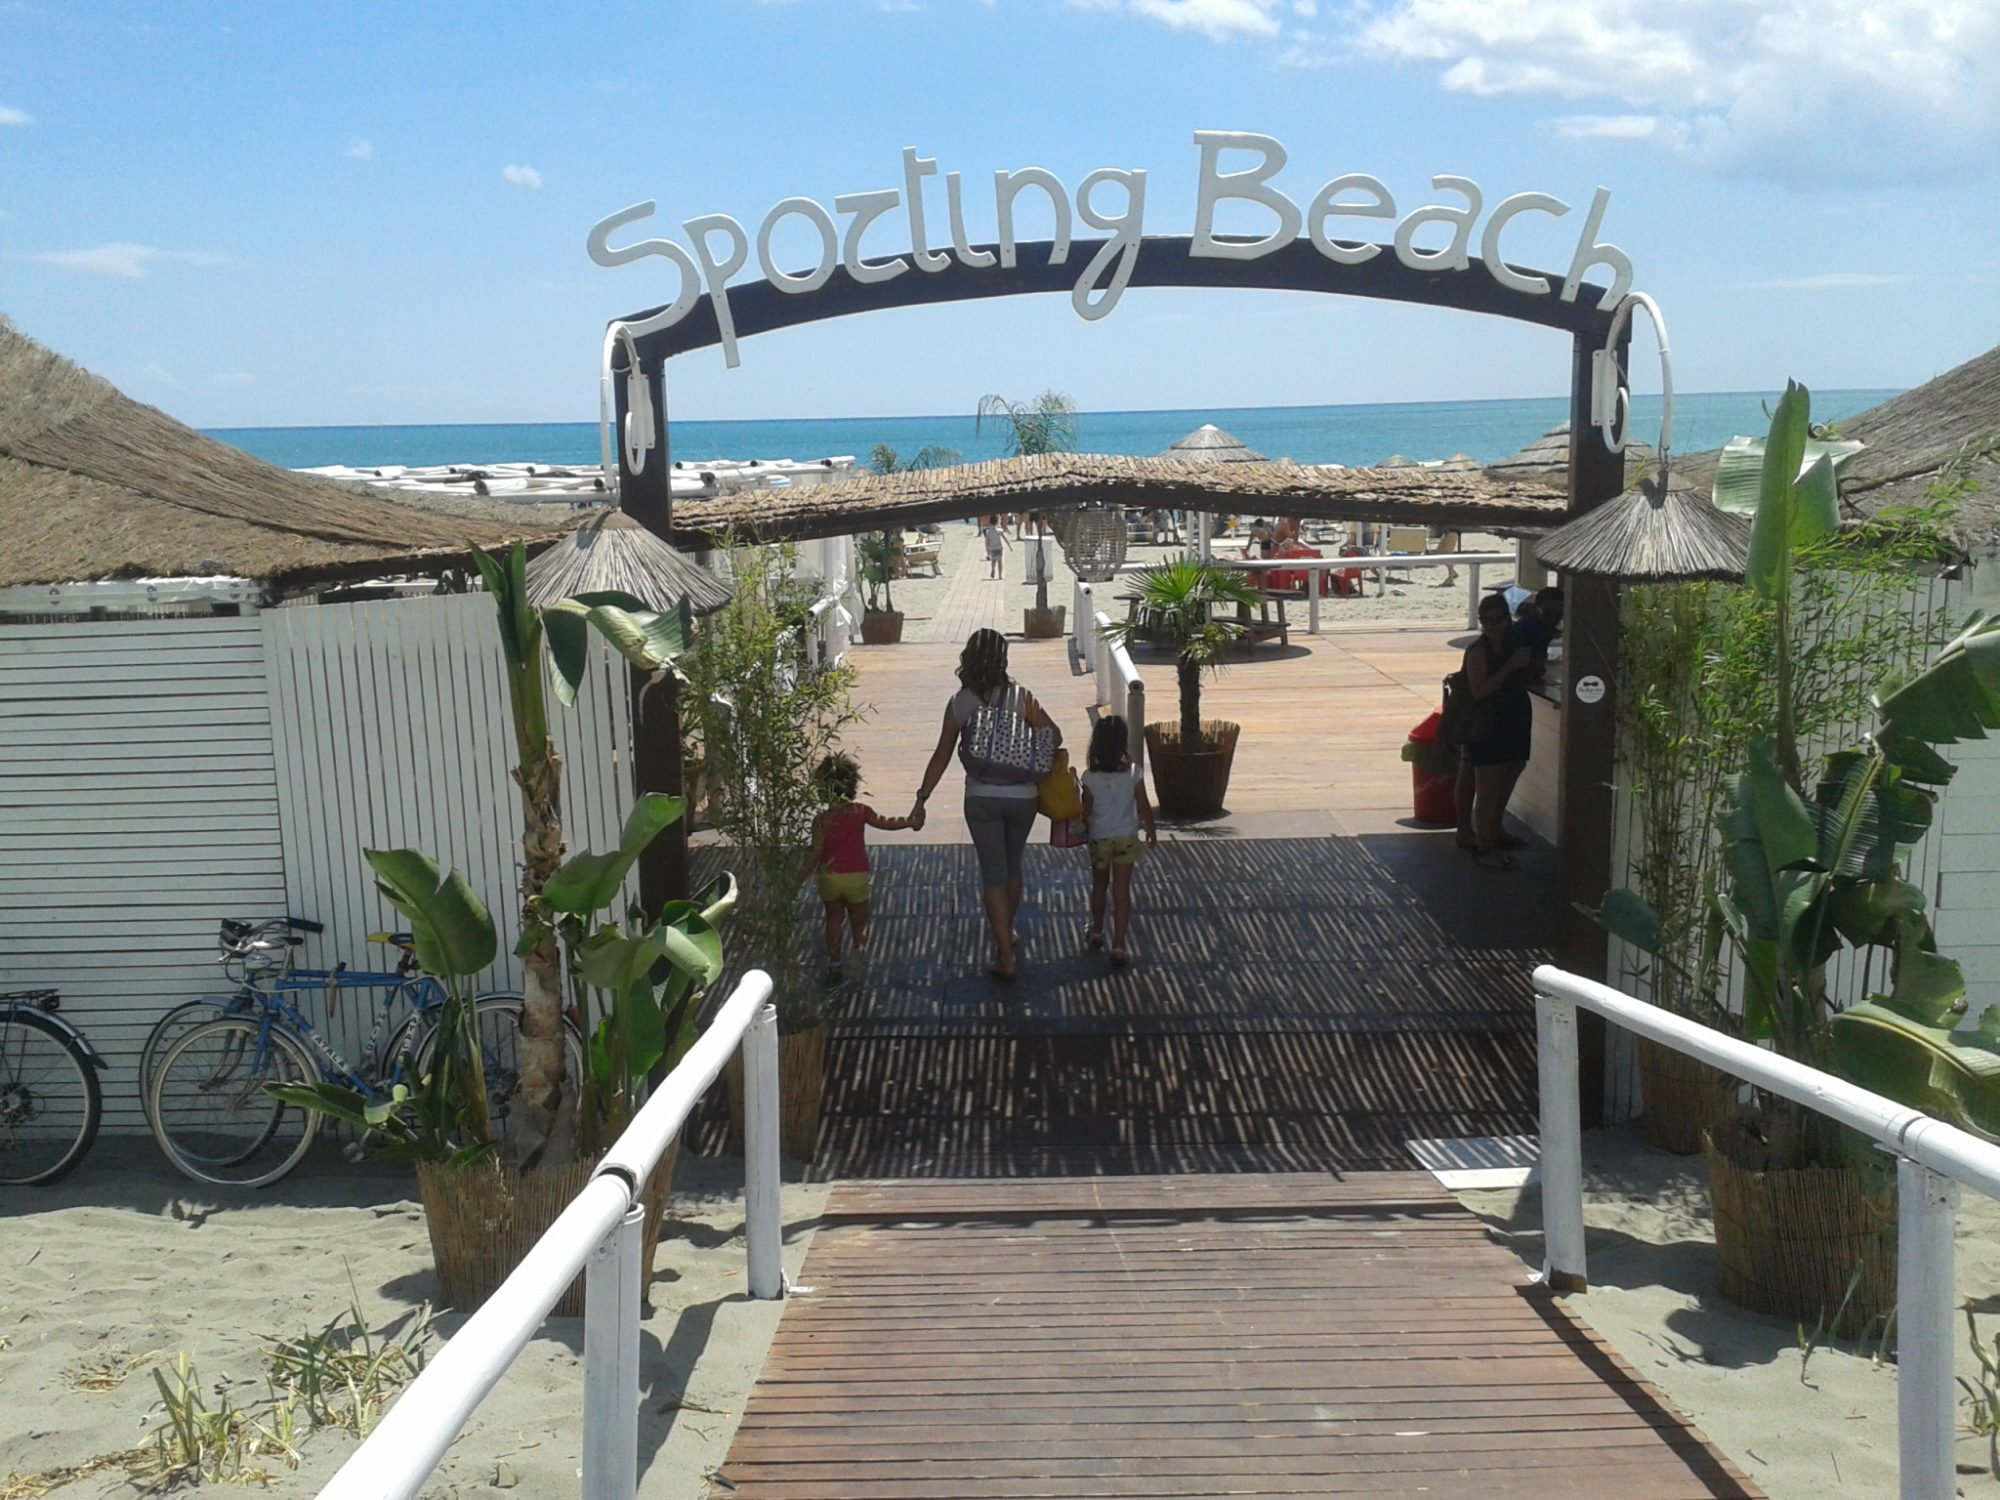 Lido Sporting Beach